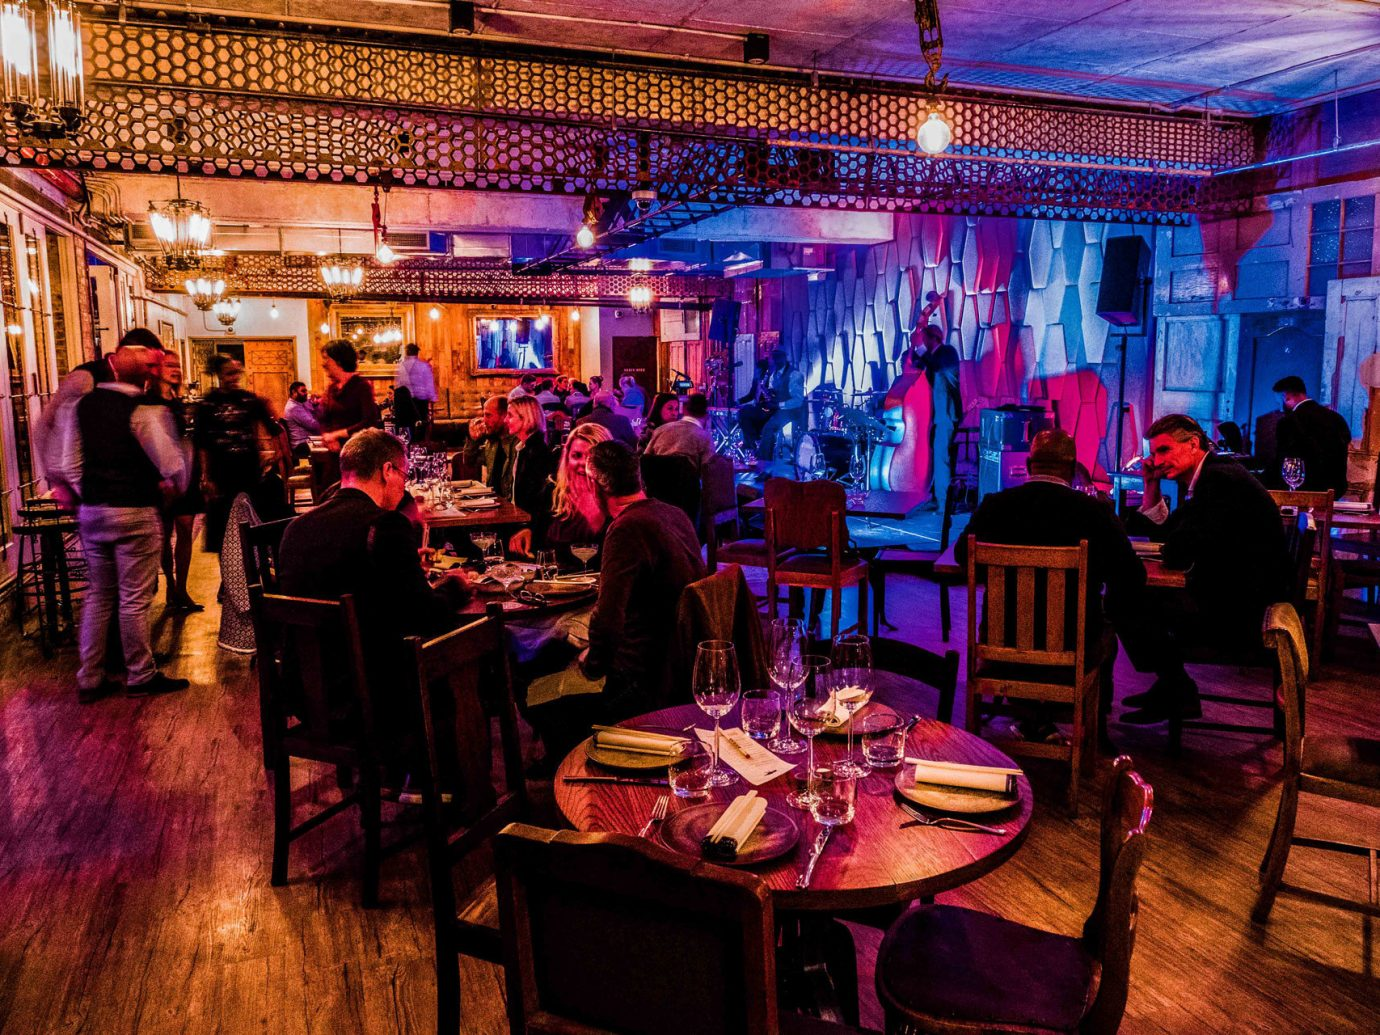 Arts + Culture Trip Ideas floor indoor function hall person purple restaurant people ceremony scene ceiling lighting wedding reception event ballroom Party group Bar banquet interior design several crowd